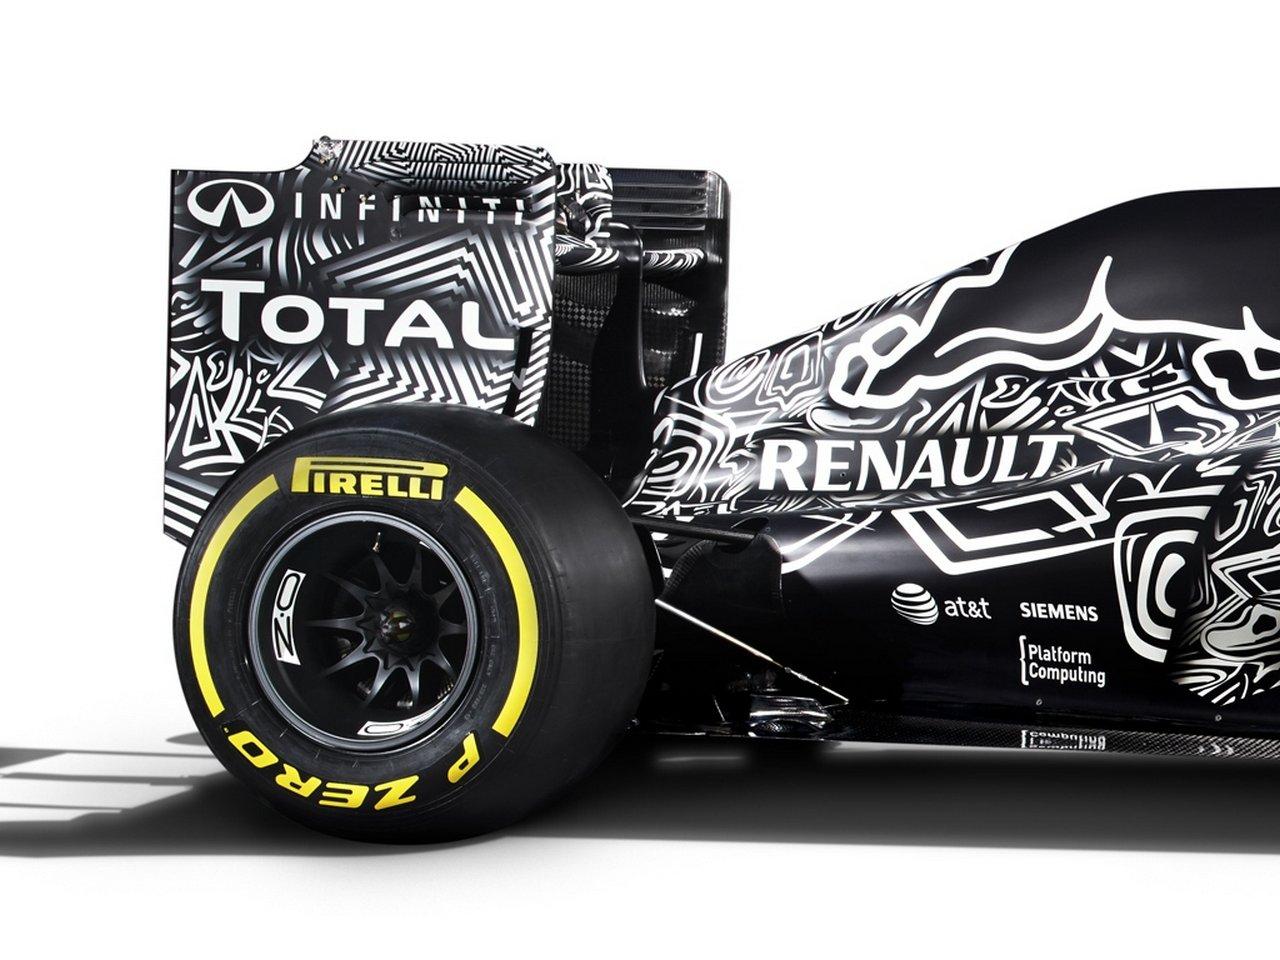 infiniti-red-bull-racing-rb-11-2015-formula-1-Daniil-Kvyat-Daniel-Ricciardo_0-100_12